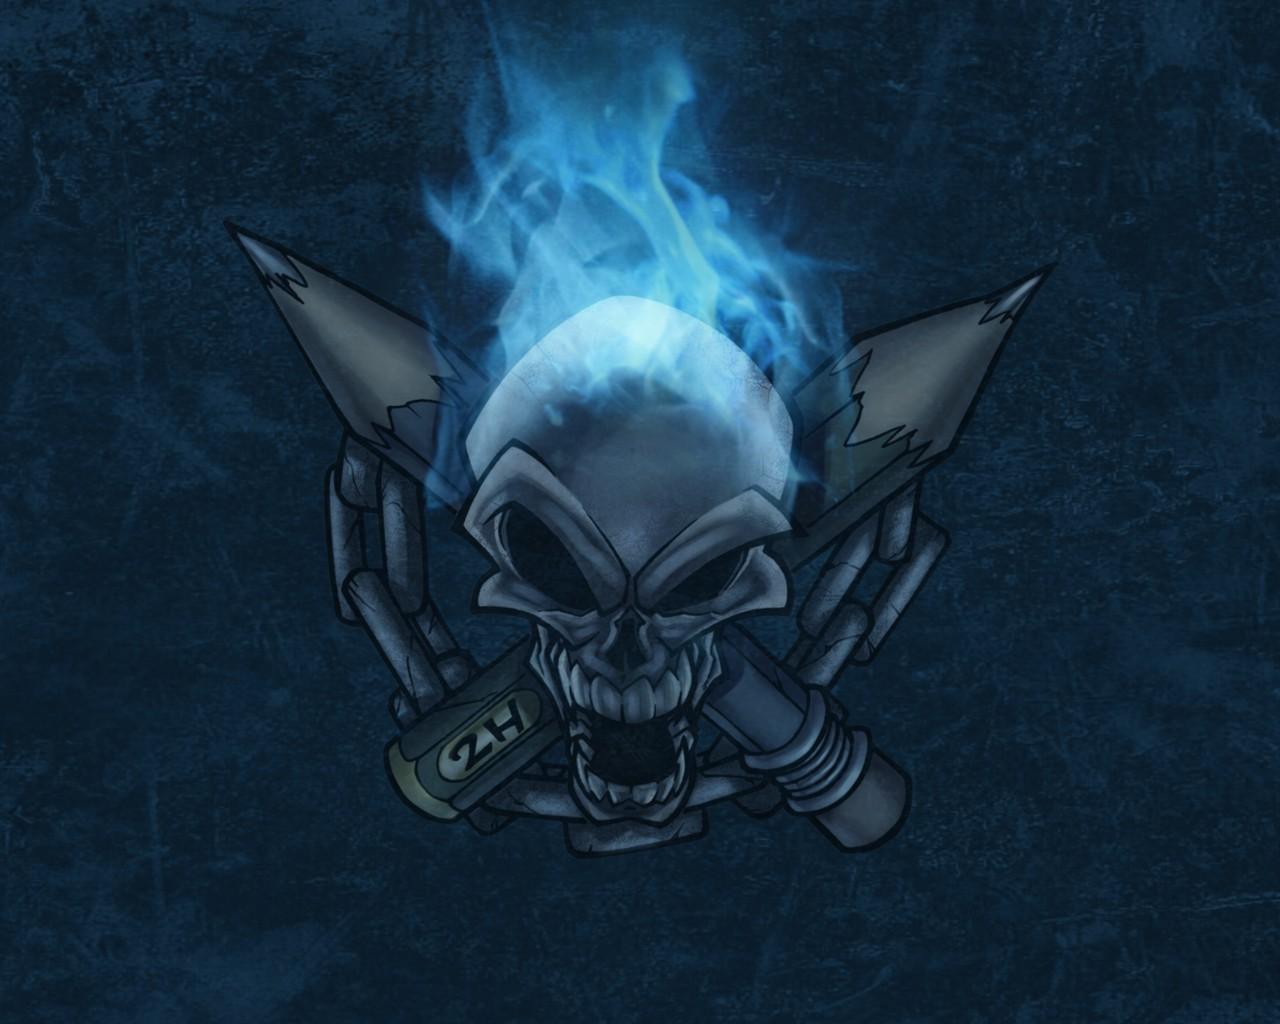 flame skull deer skull drawings chacma baboon skull related pics skull 1280x1024